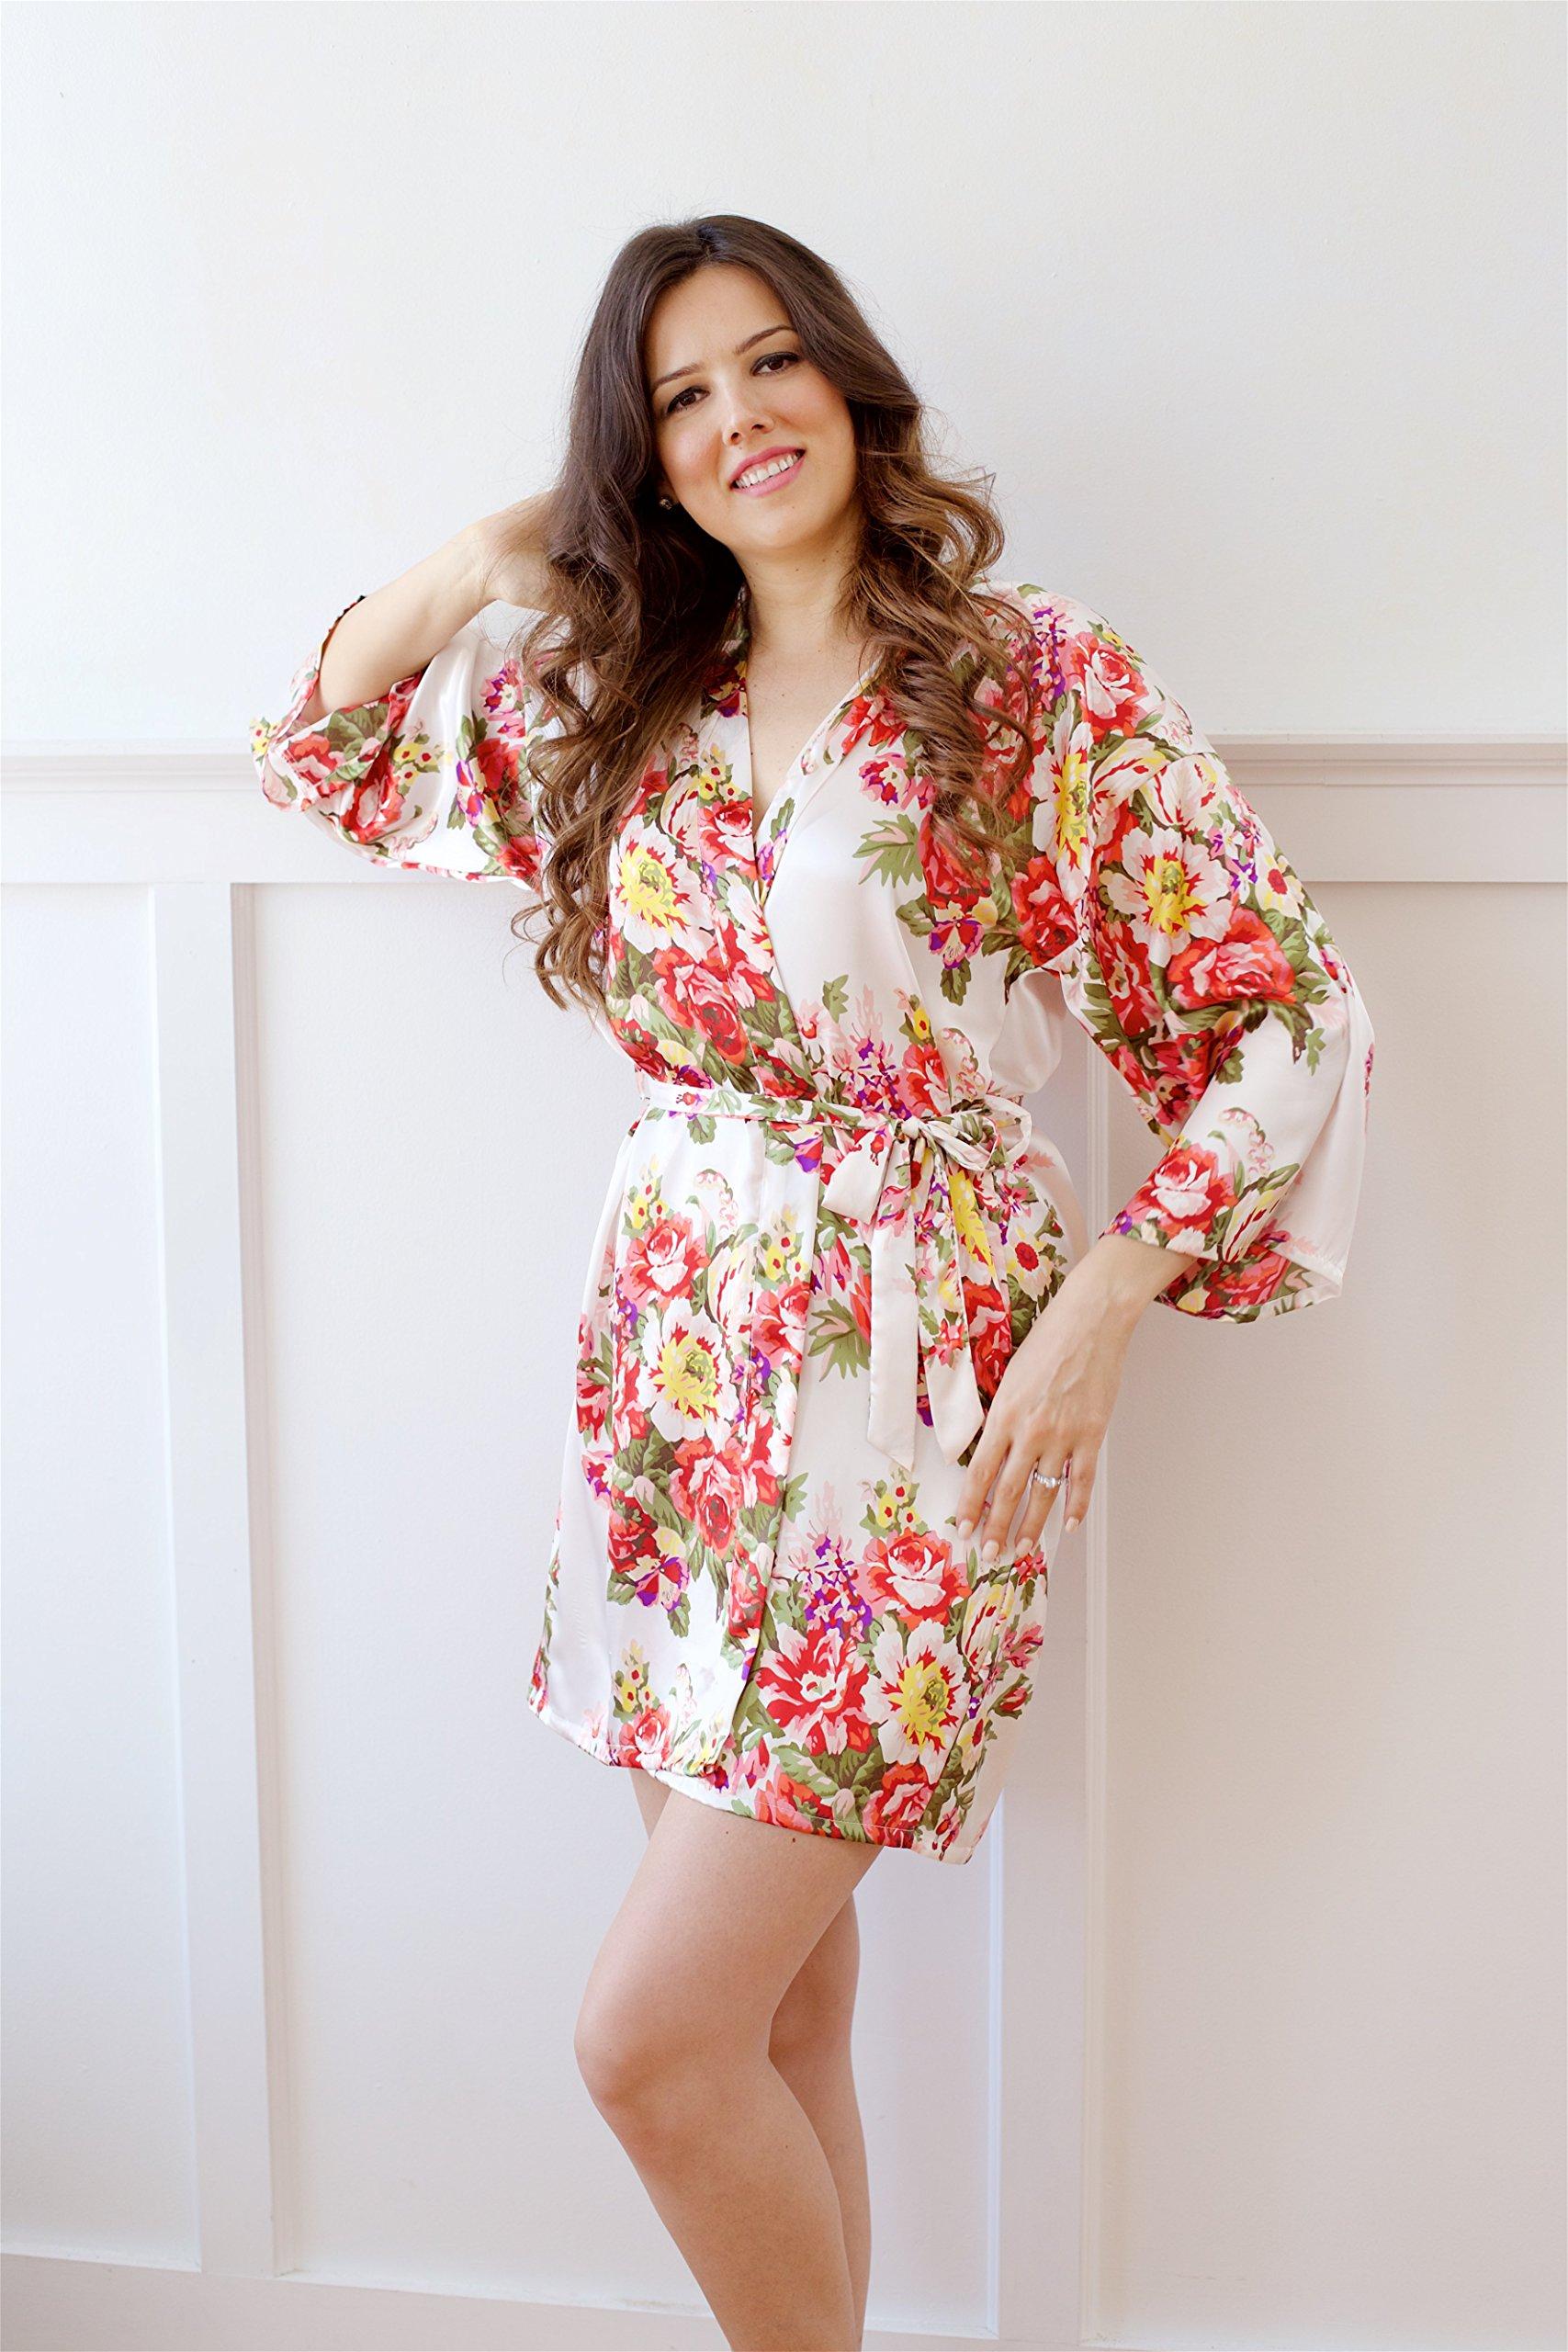 American Cuteness Silk Robes & Gift Pouches - Floral Satin Kimono Robe, Bridesmaid Gift, Bachelorette Bridal Party Getting Ready, Wedding Favor (Plus Size (14-22 US), White)